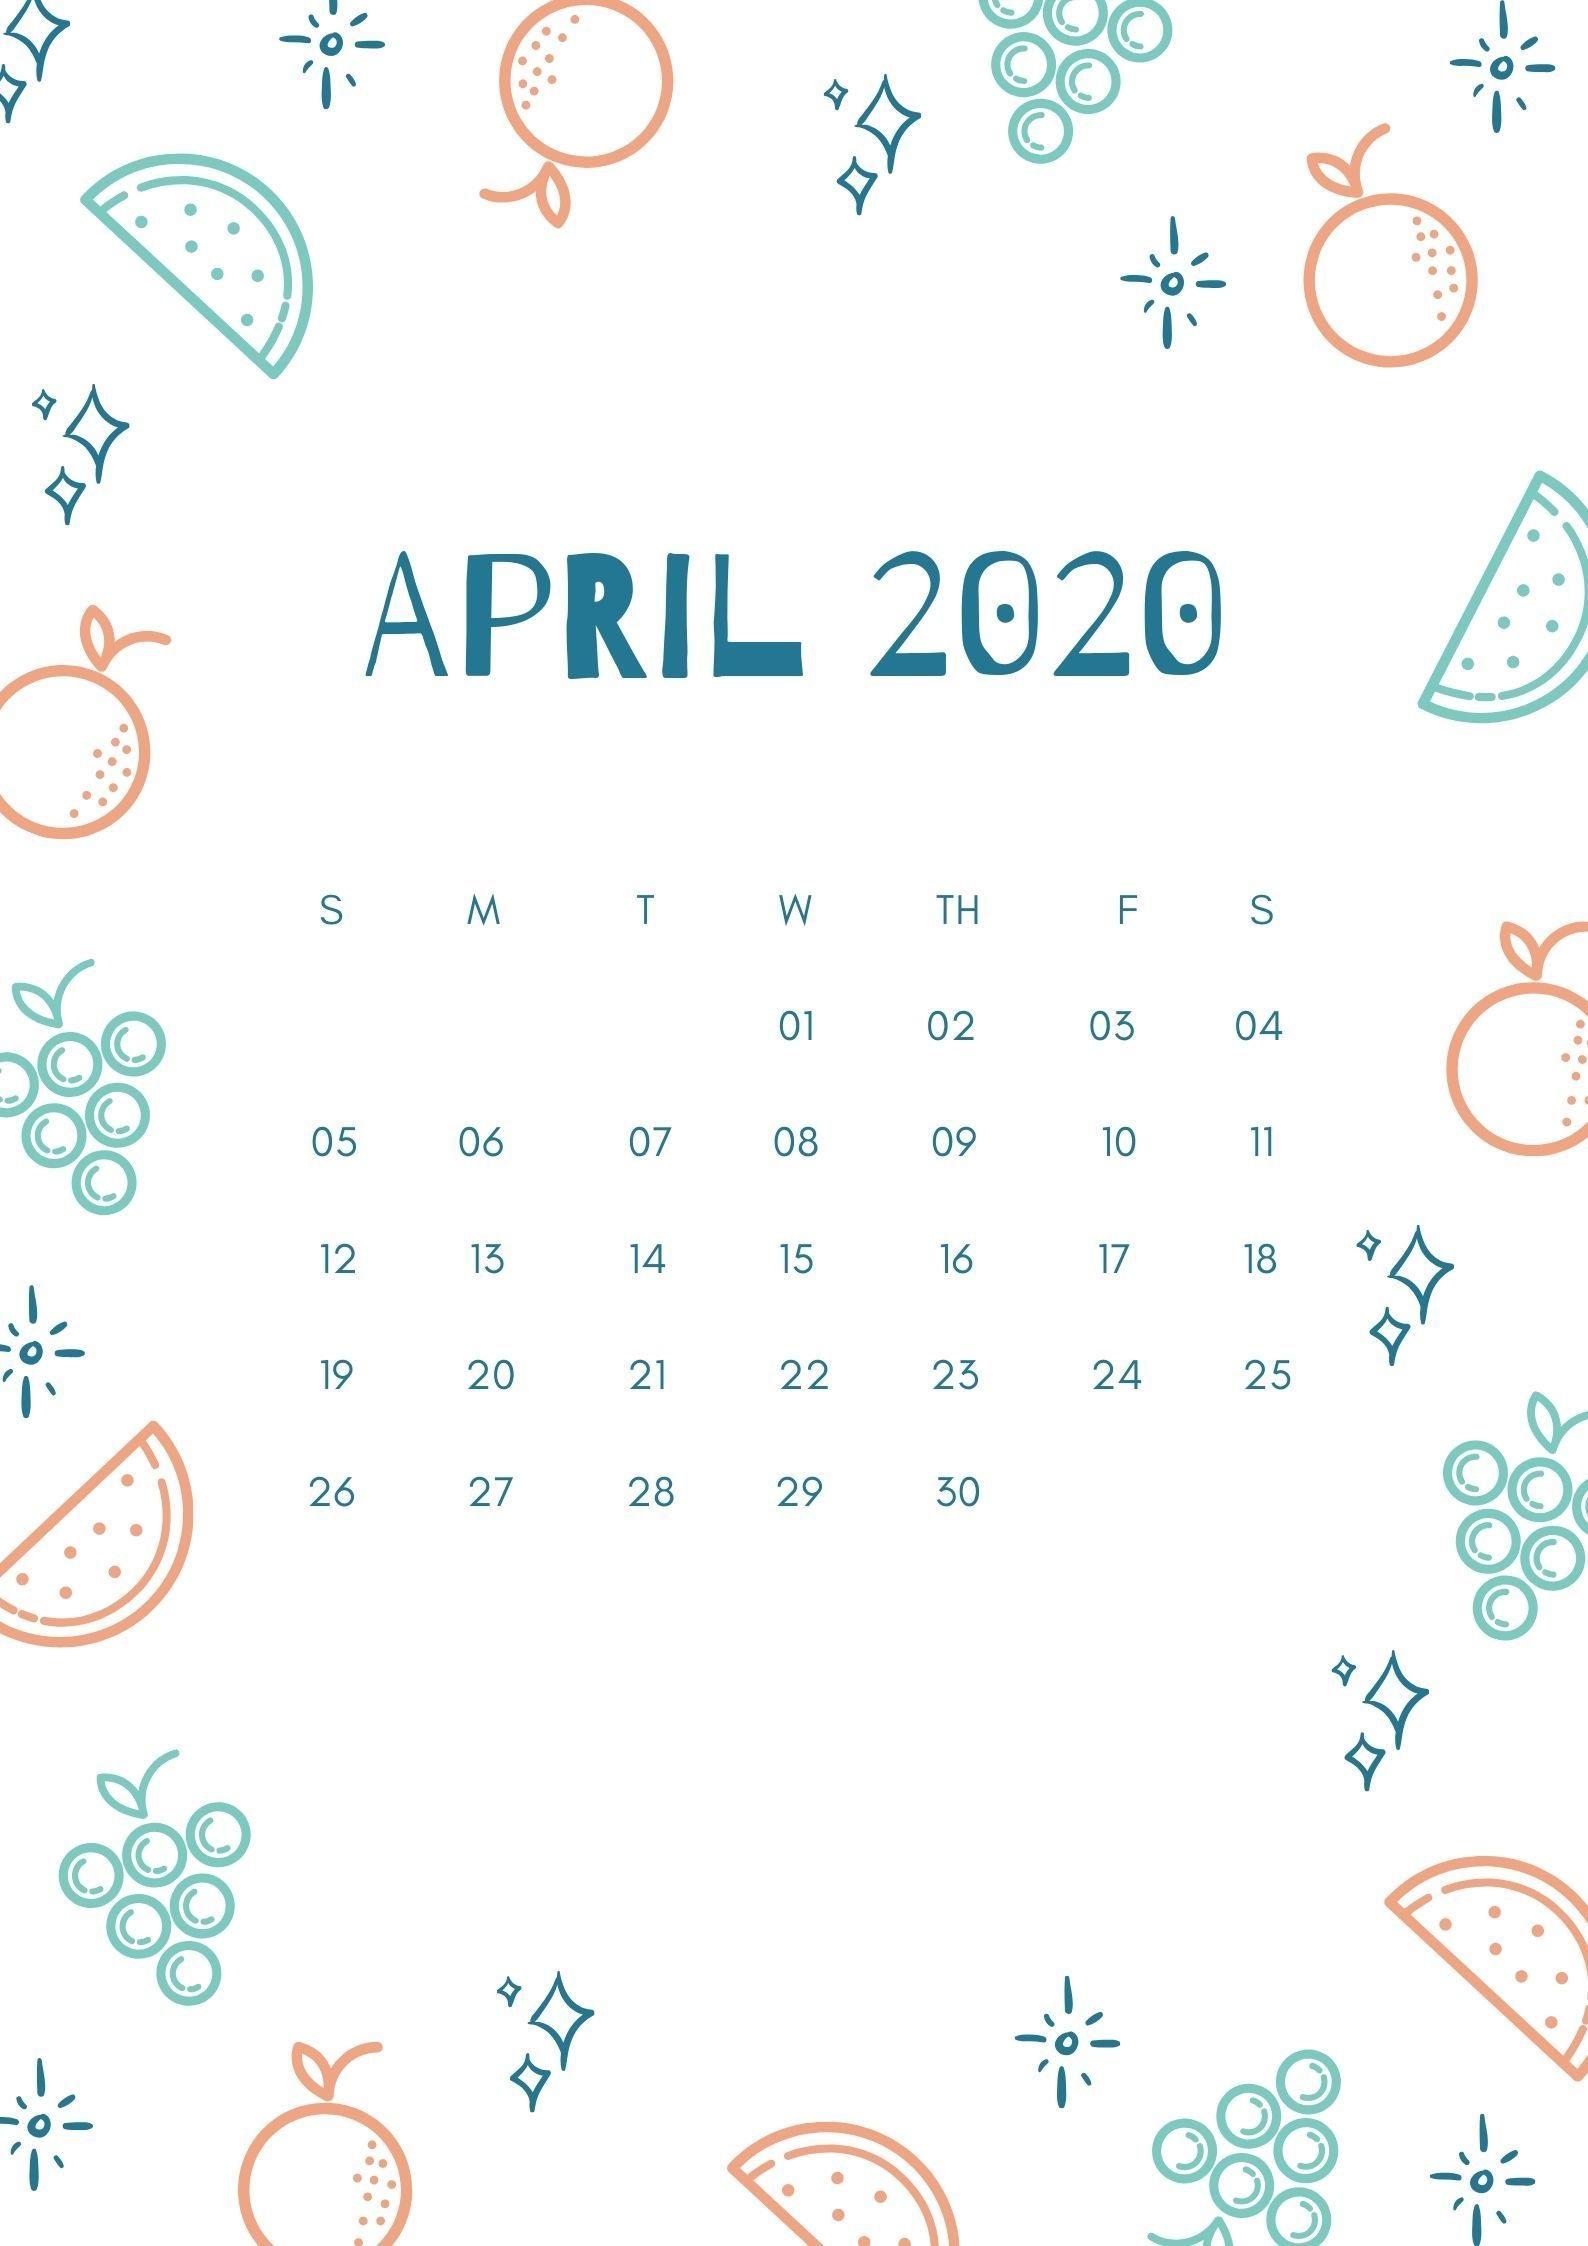 Cute April 2020 iPhone Calendar